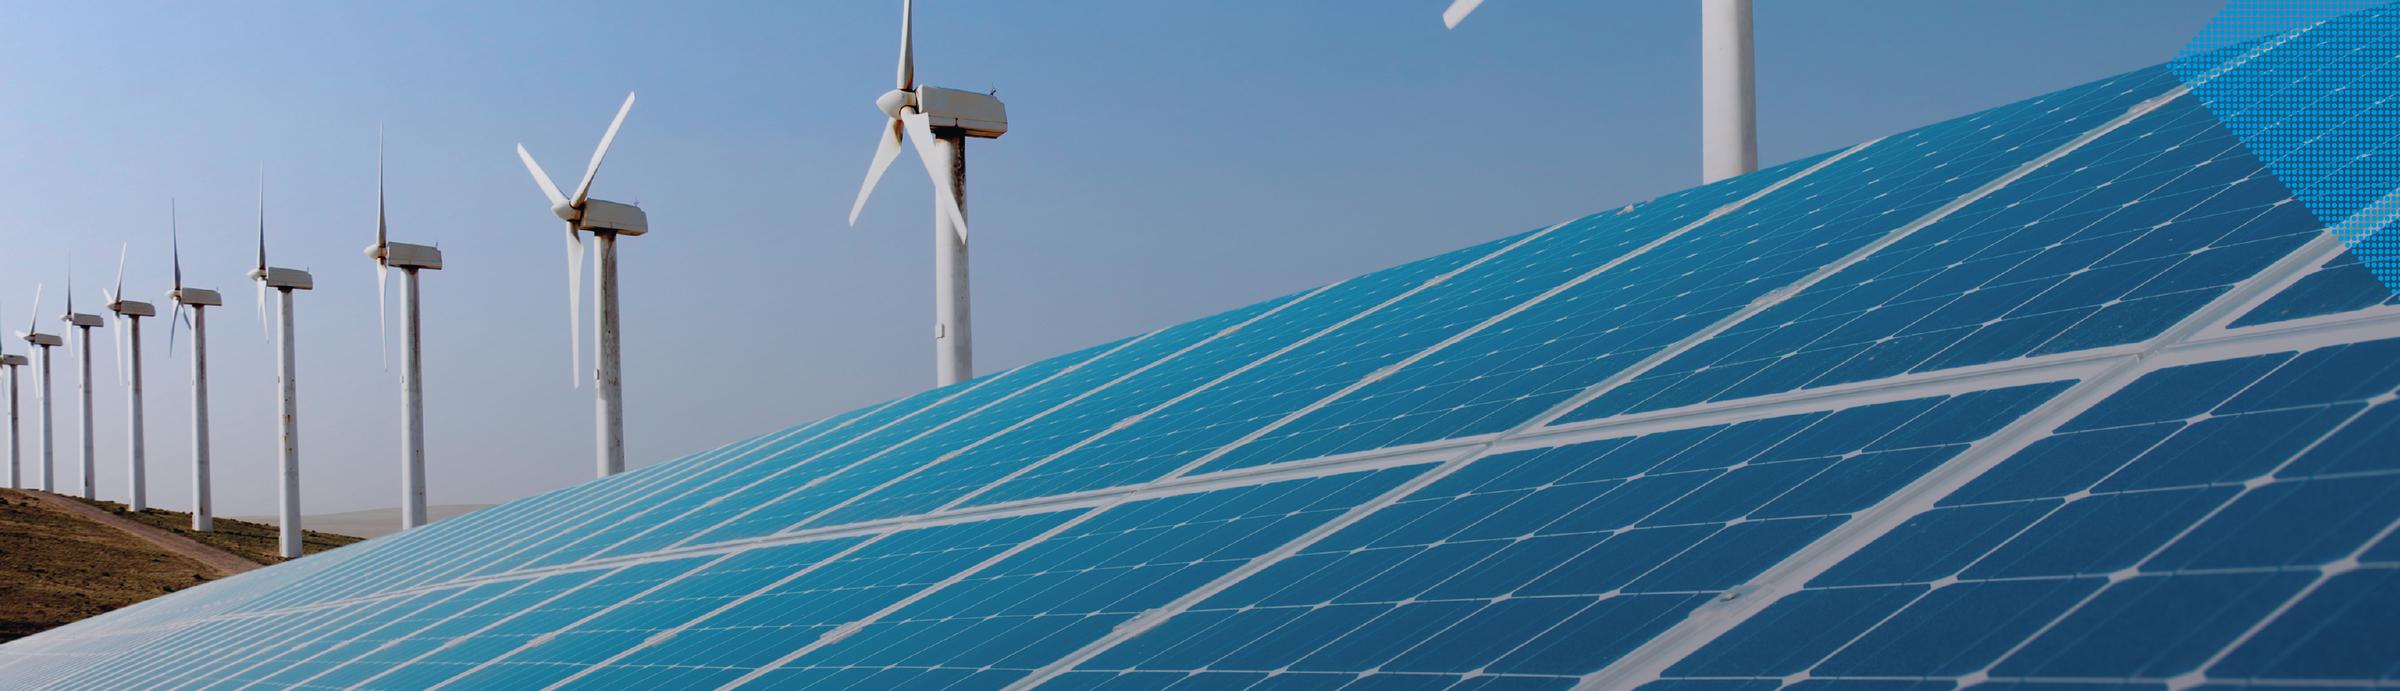 Home - Erneuerbare Energien